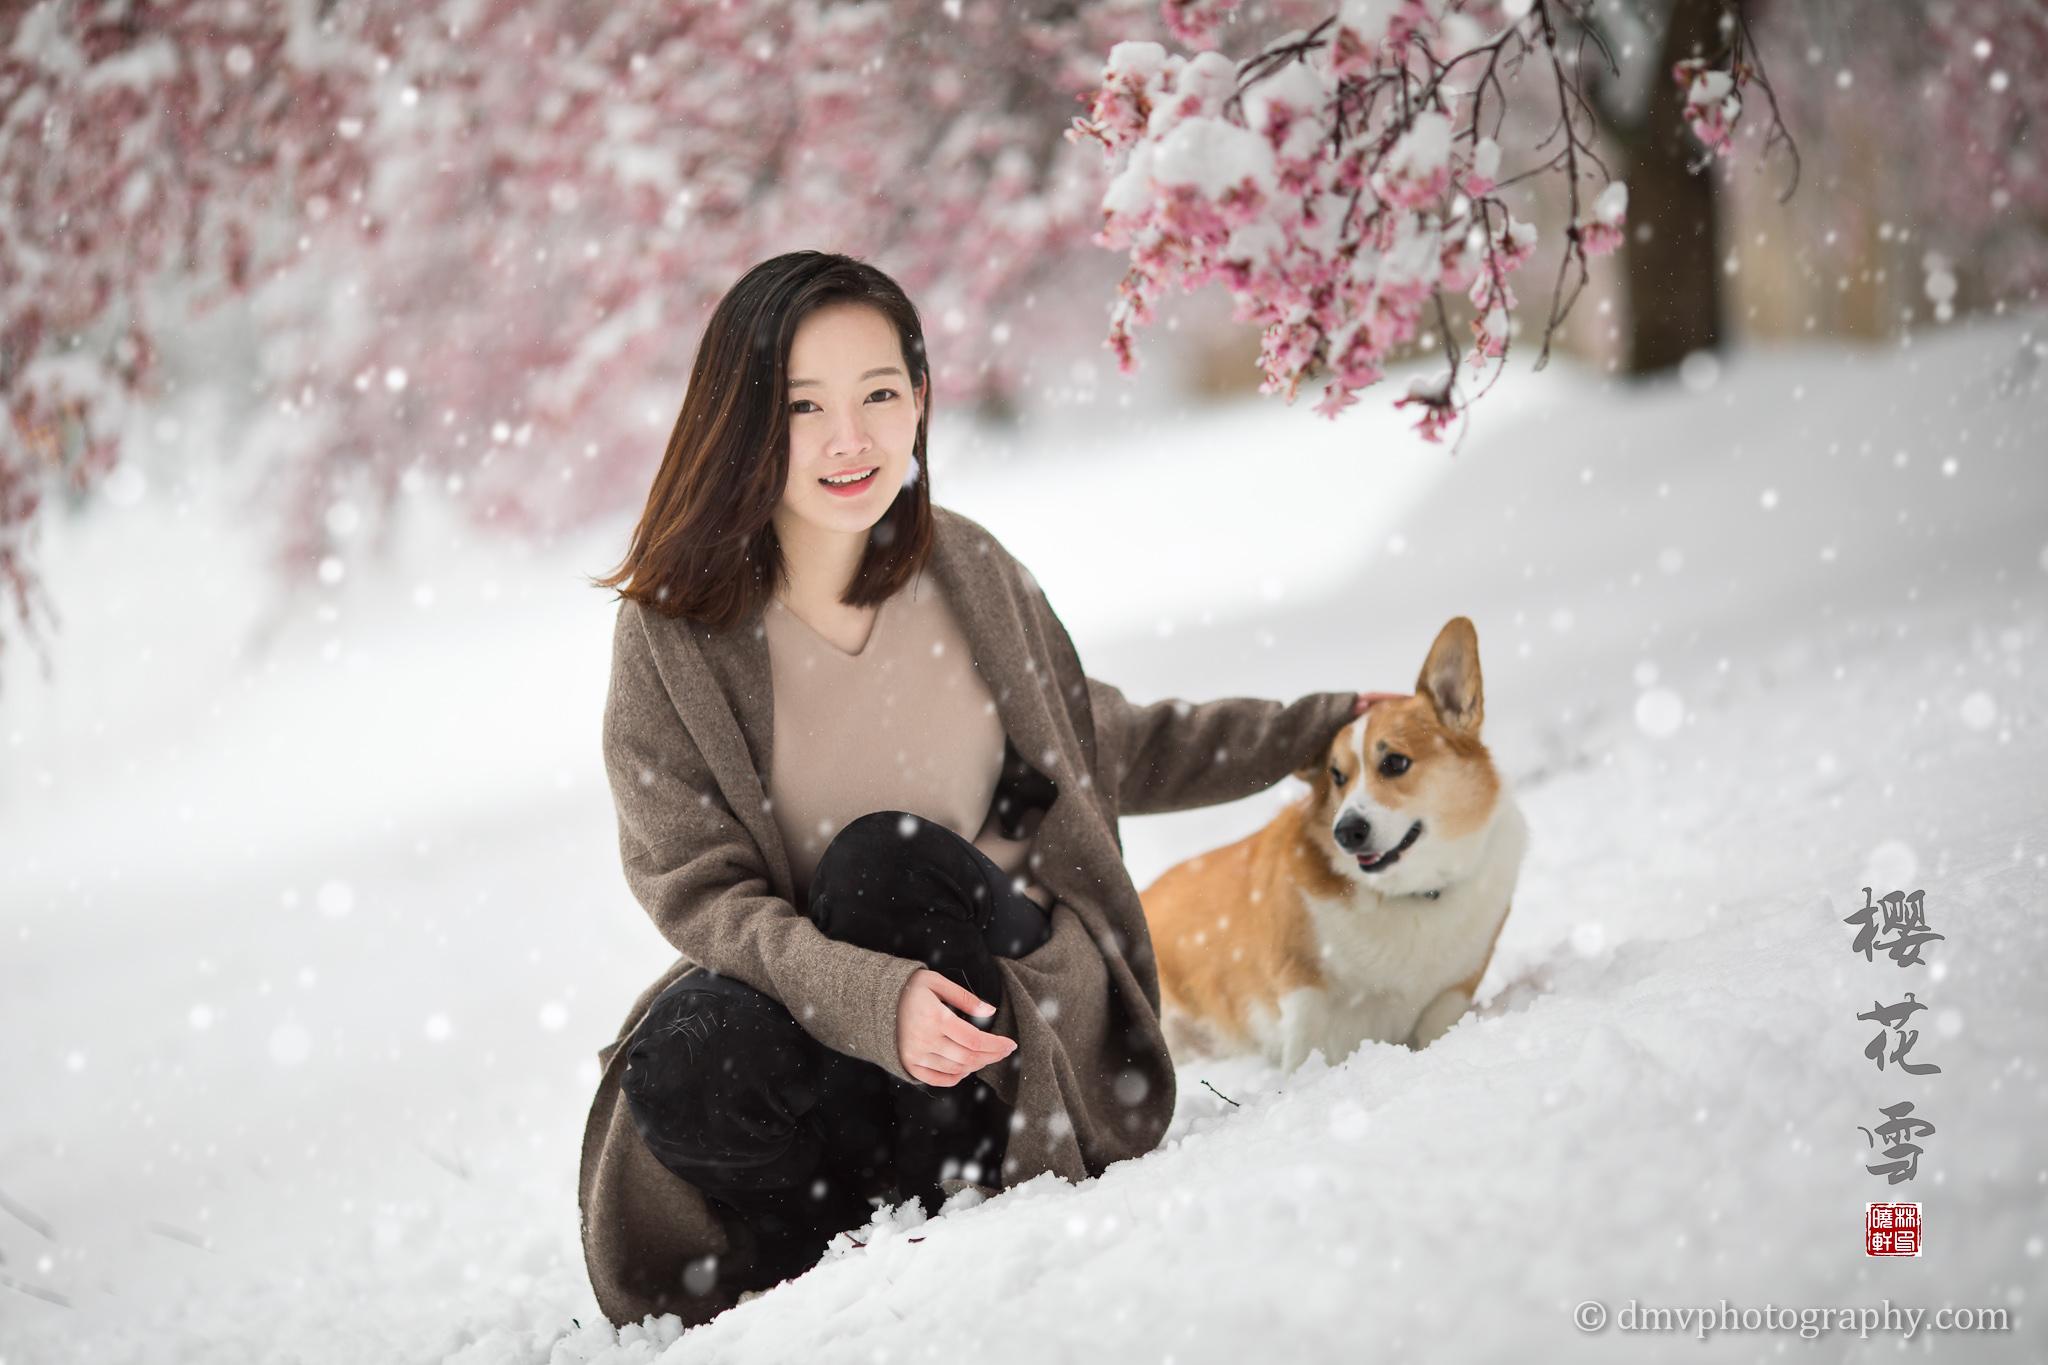 _D4_8402-snow